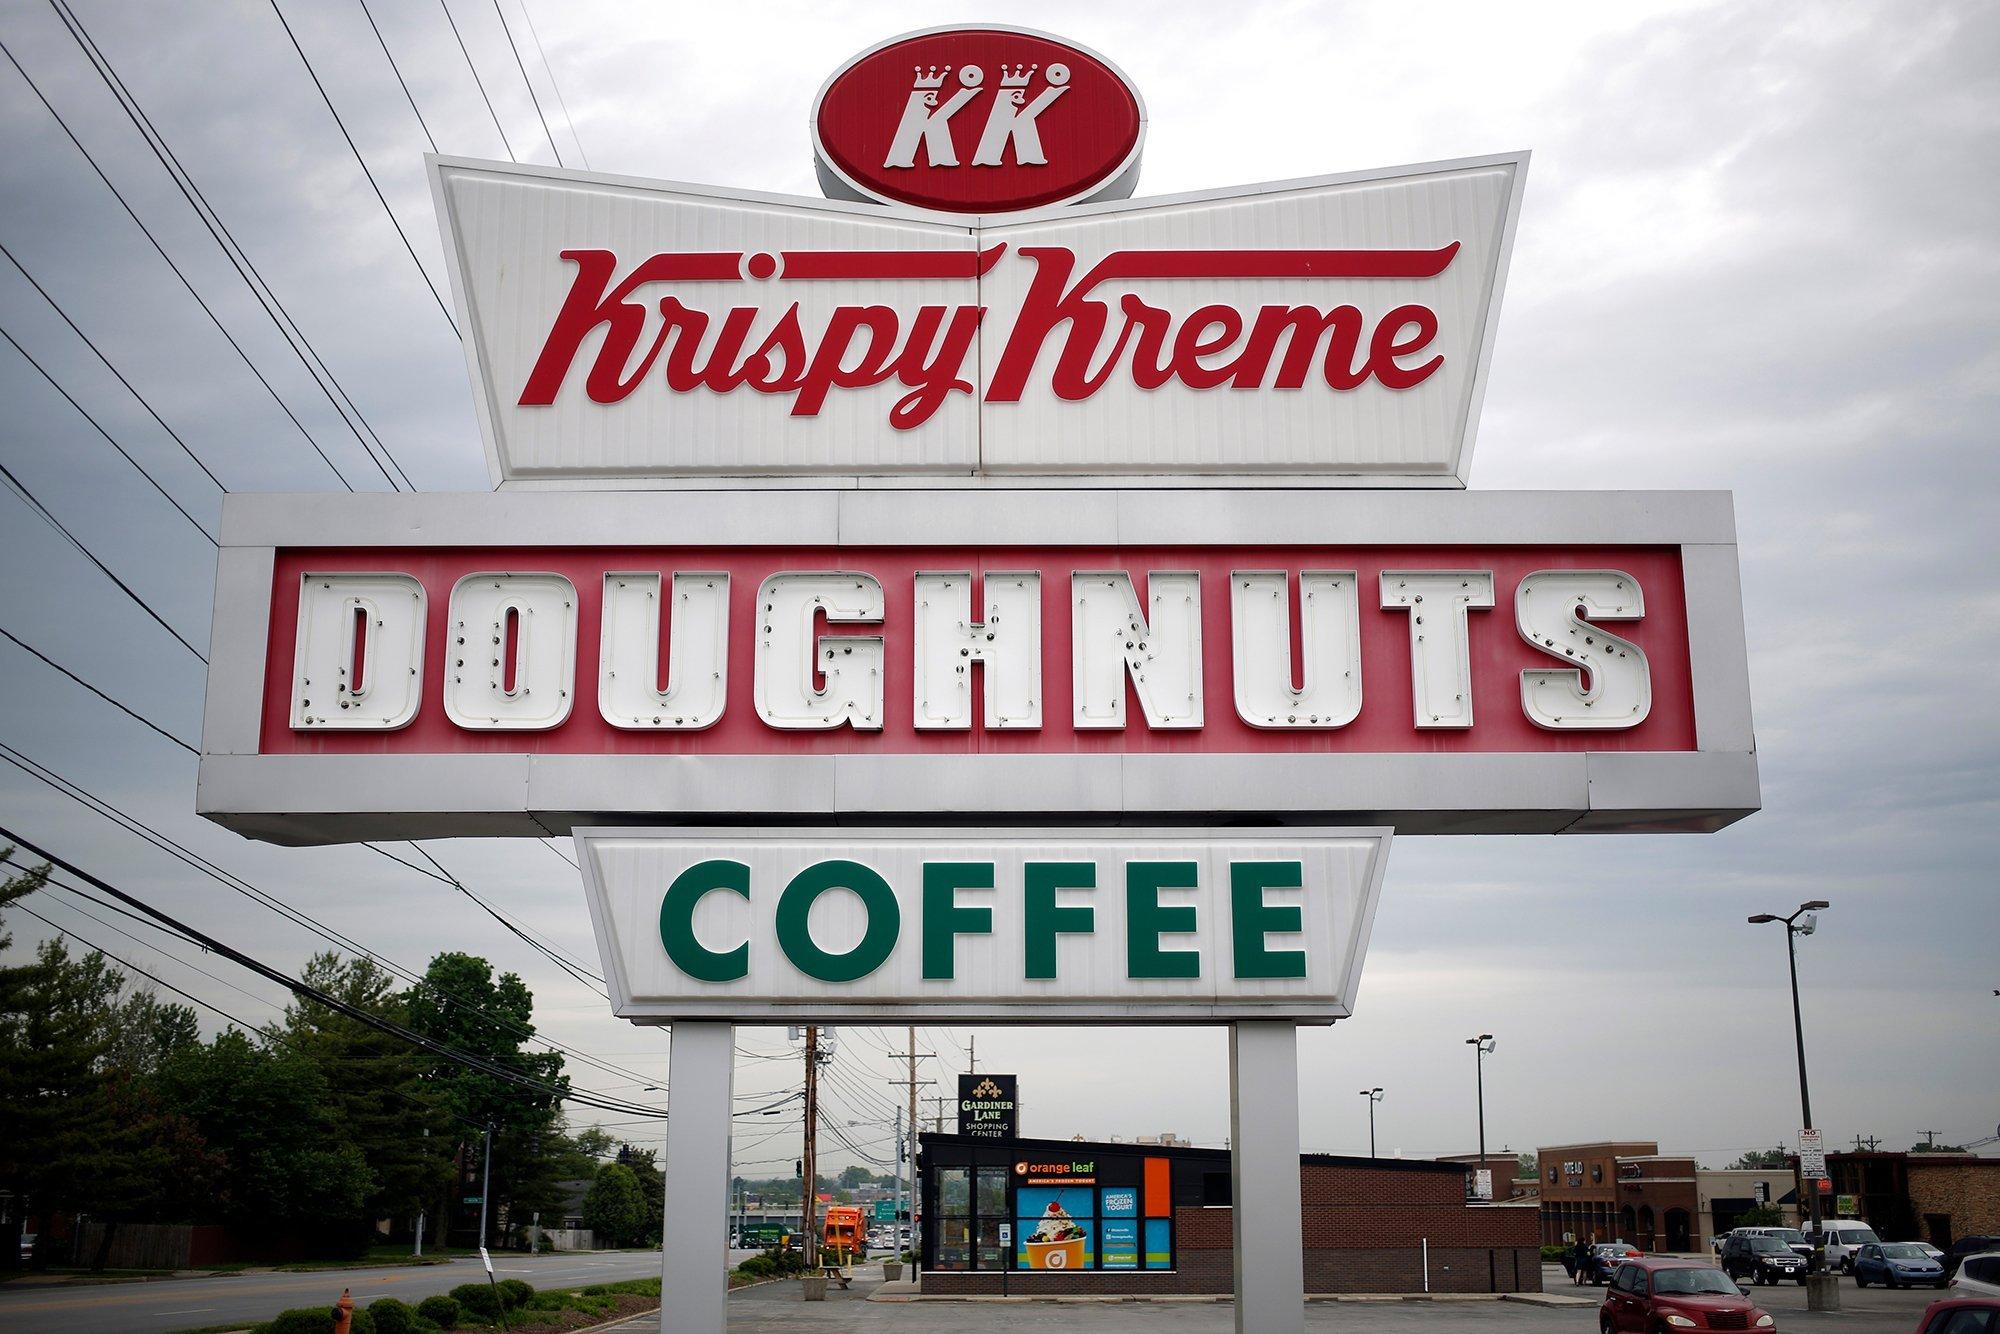 Krispy Kreme owners donate $5 million to Holocaust survivors over family's Nazi past